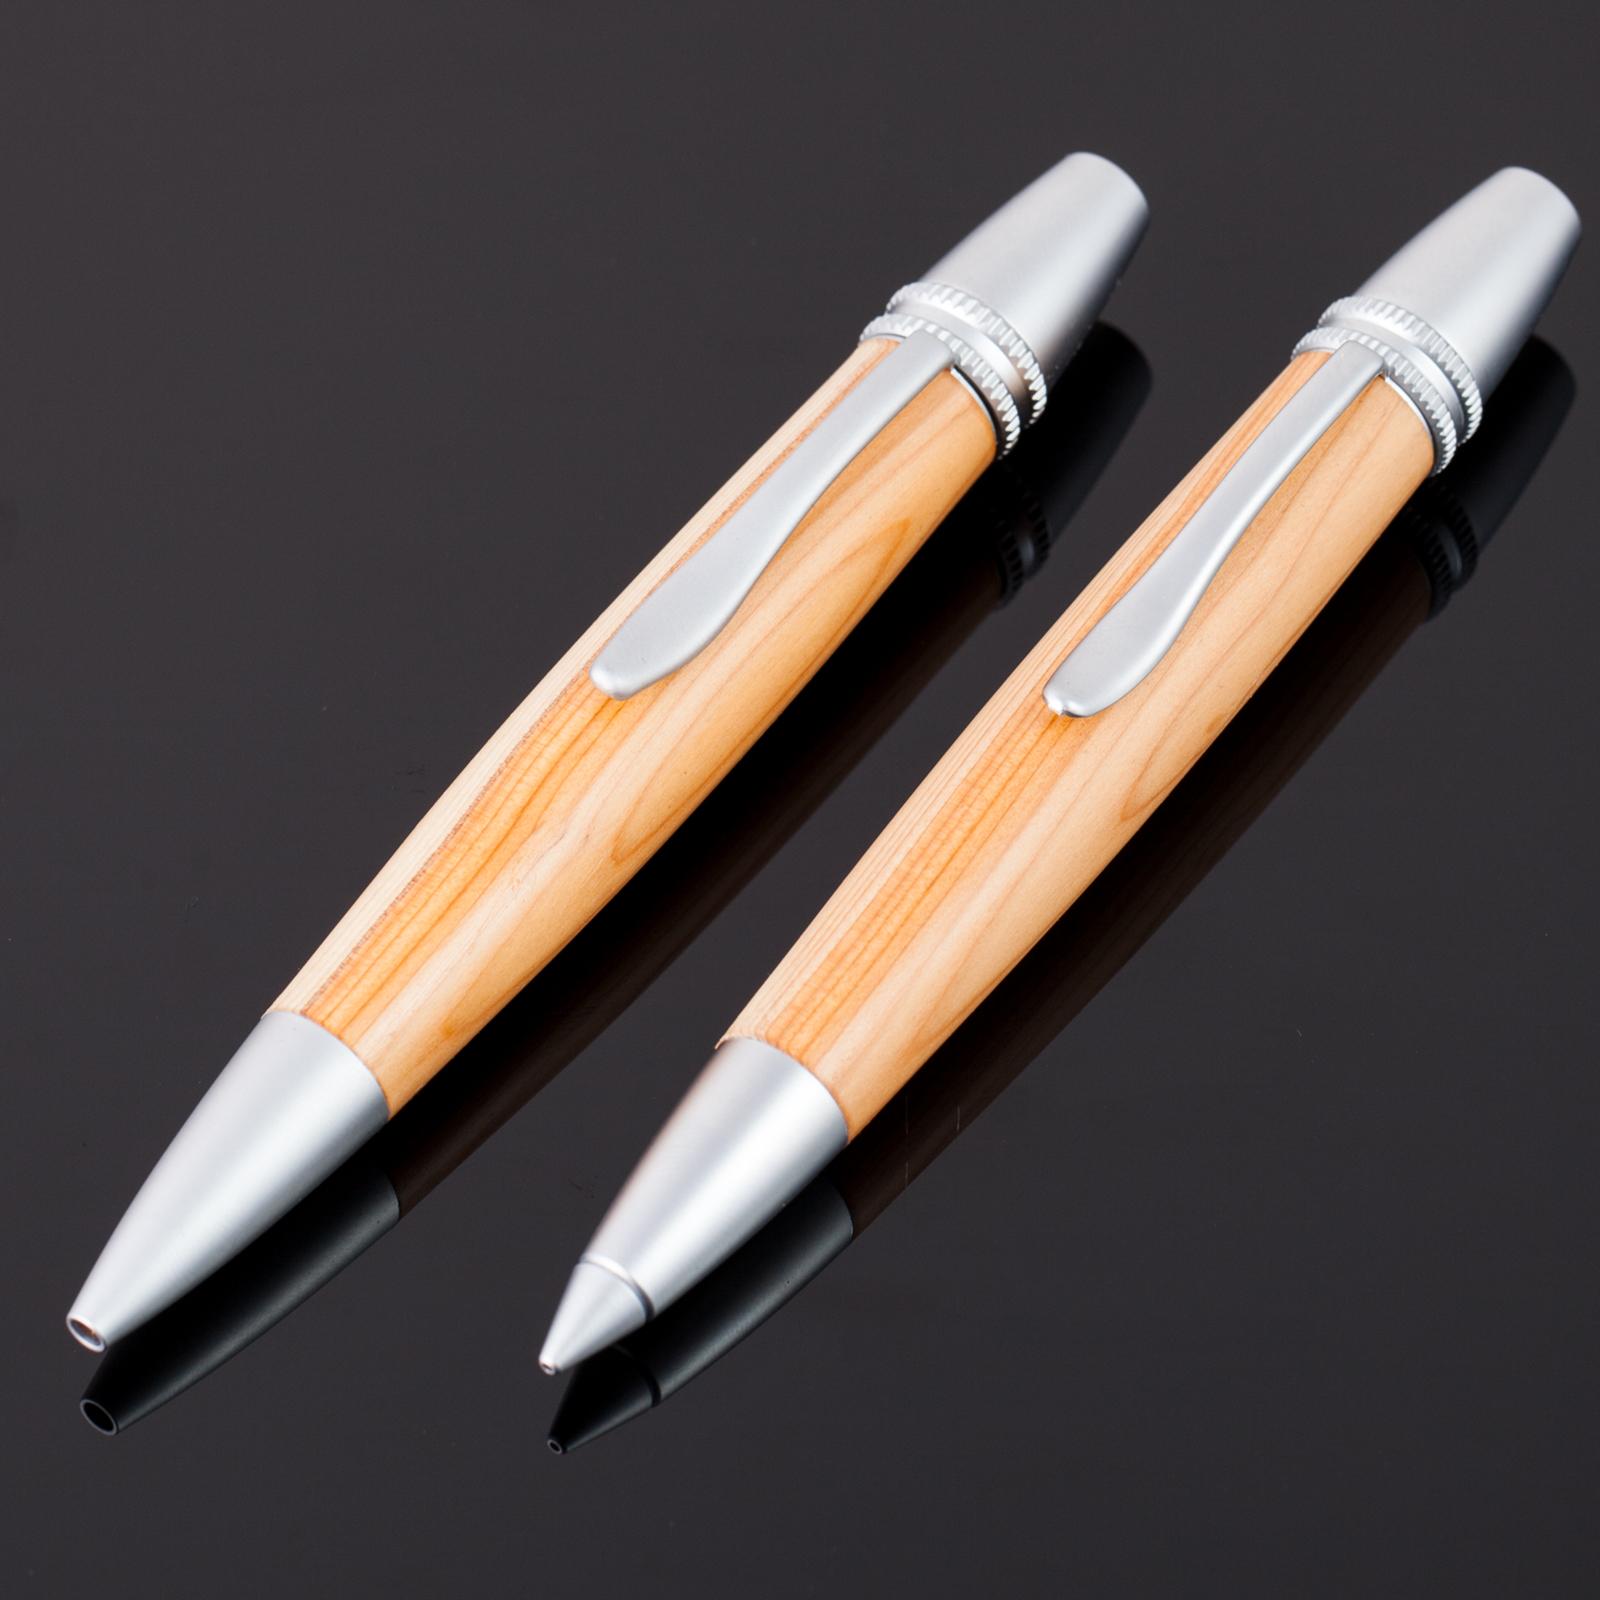 Eibe-Holz-Kugelschreiber-Bleistift-Polaris-001